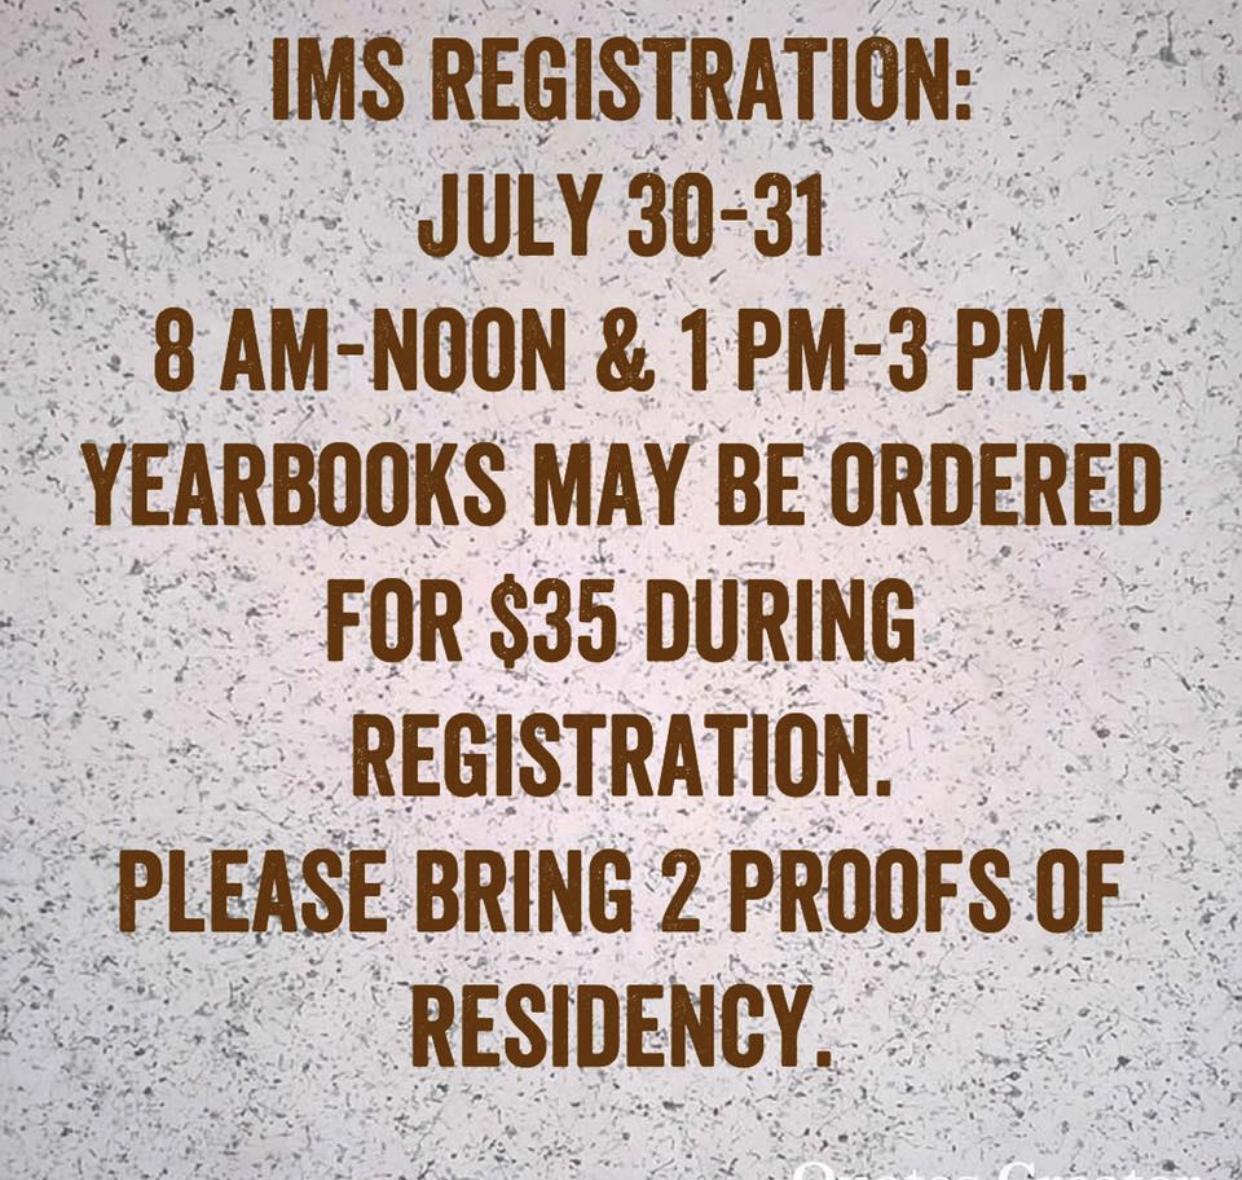 IMS Registration